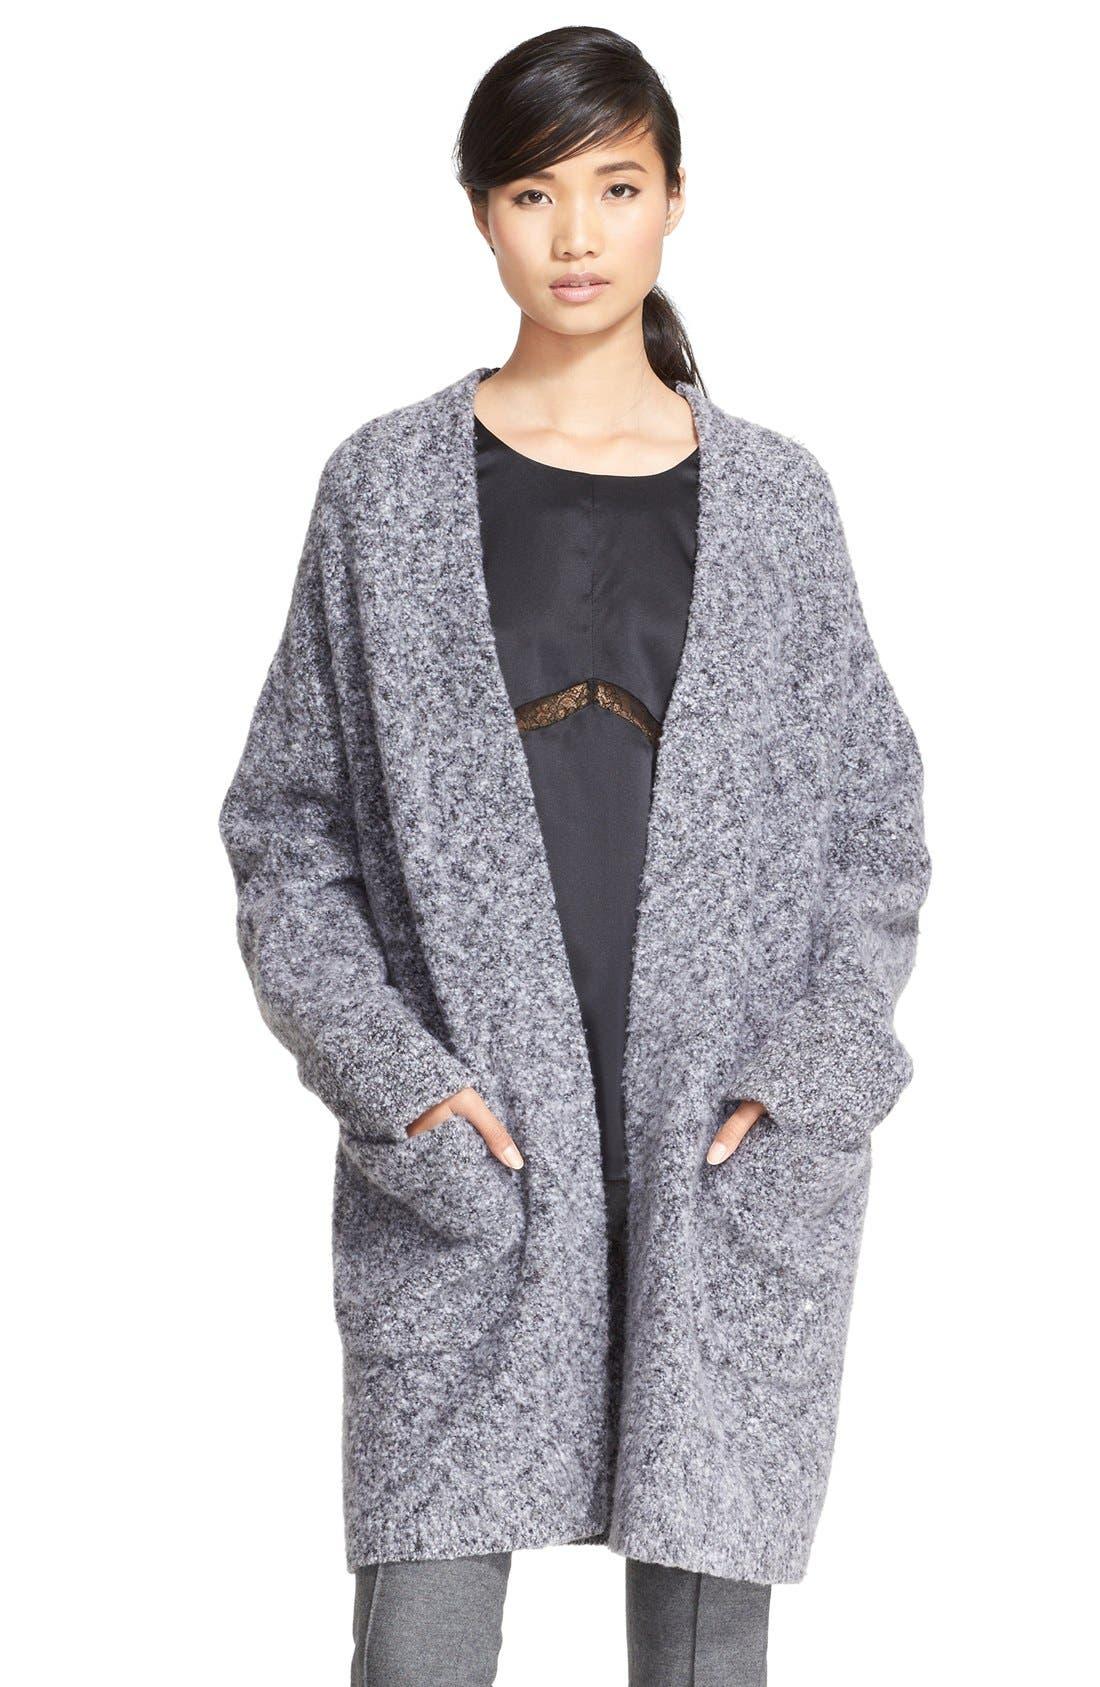 Alternate Image 1 Selected - rag & bone 'Diana' Wool Blend Sweater Coat